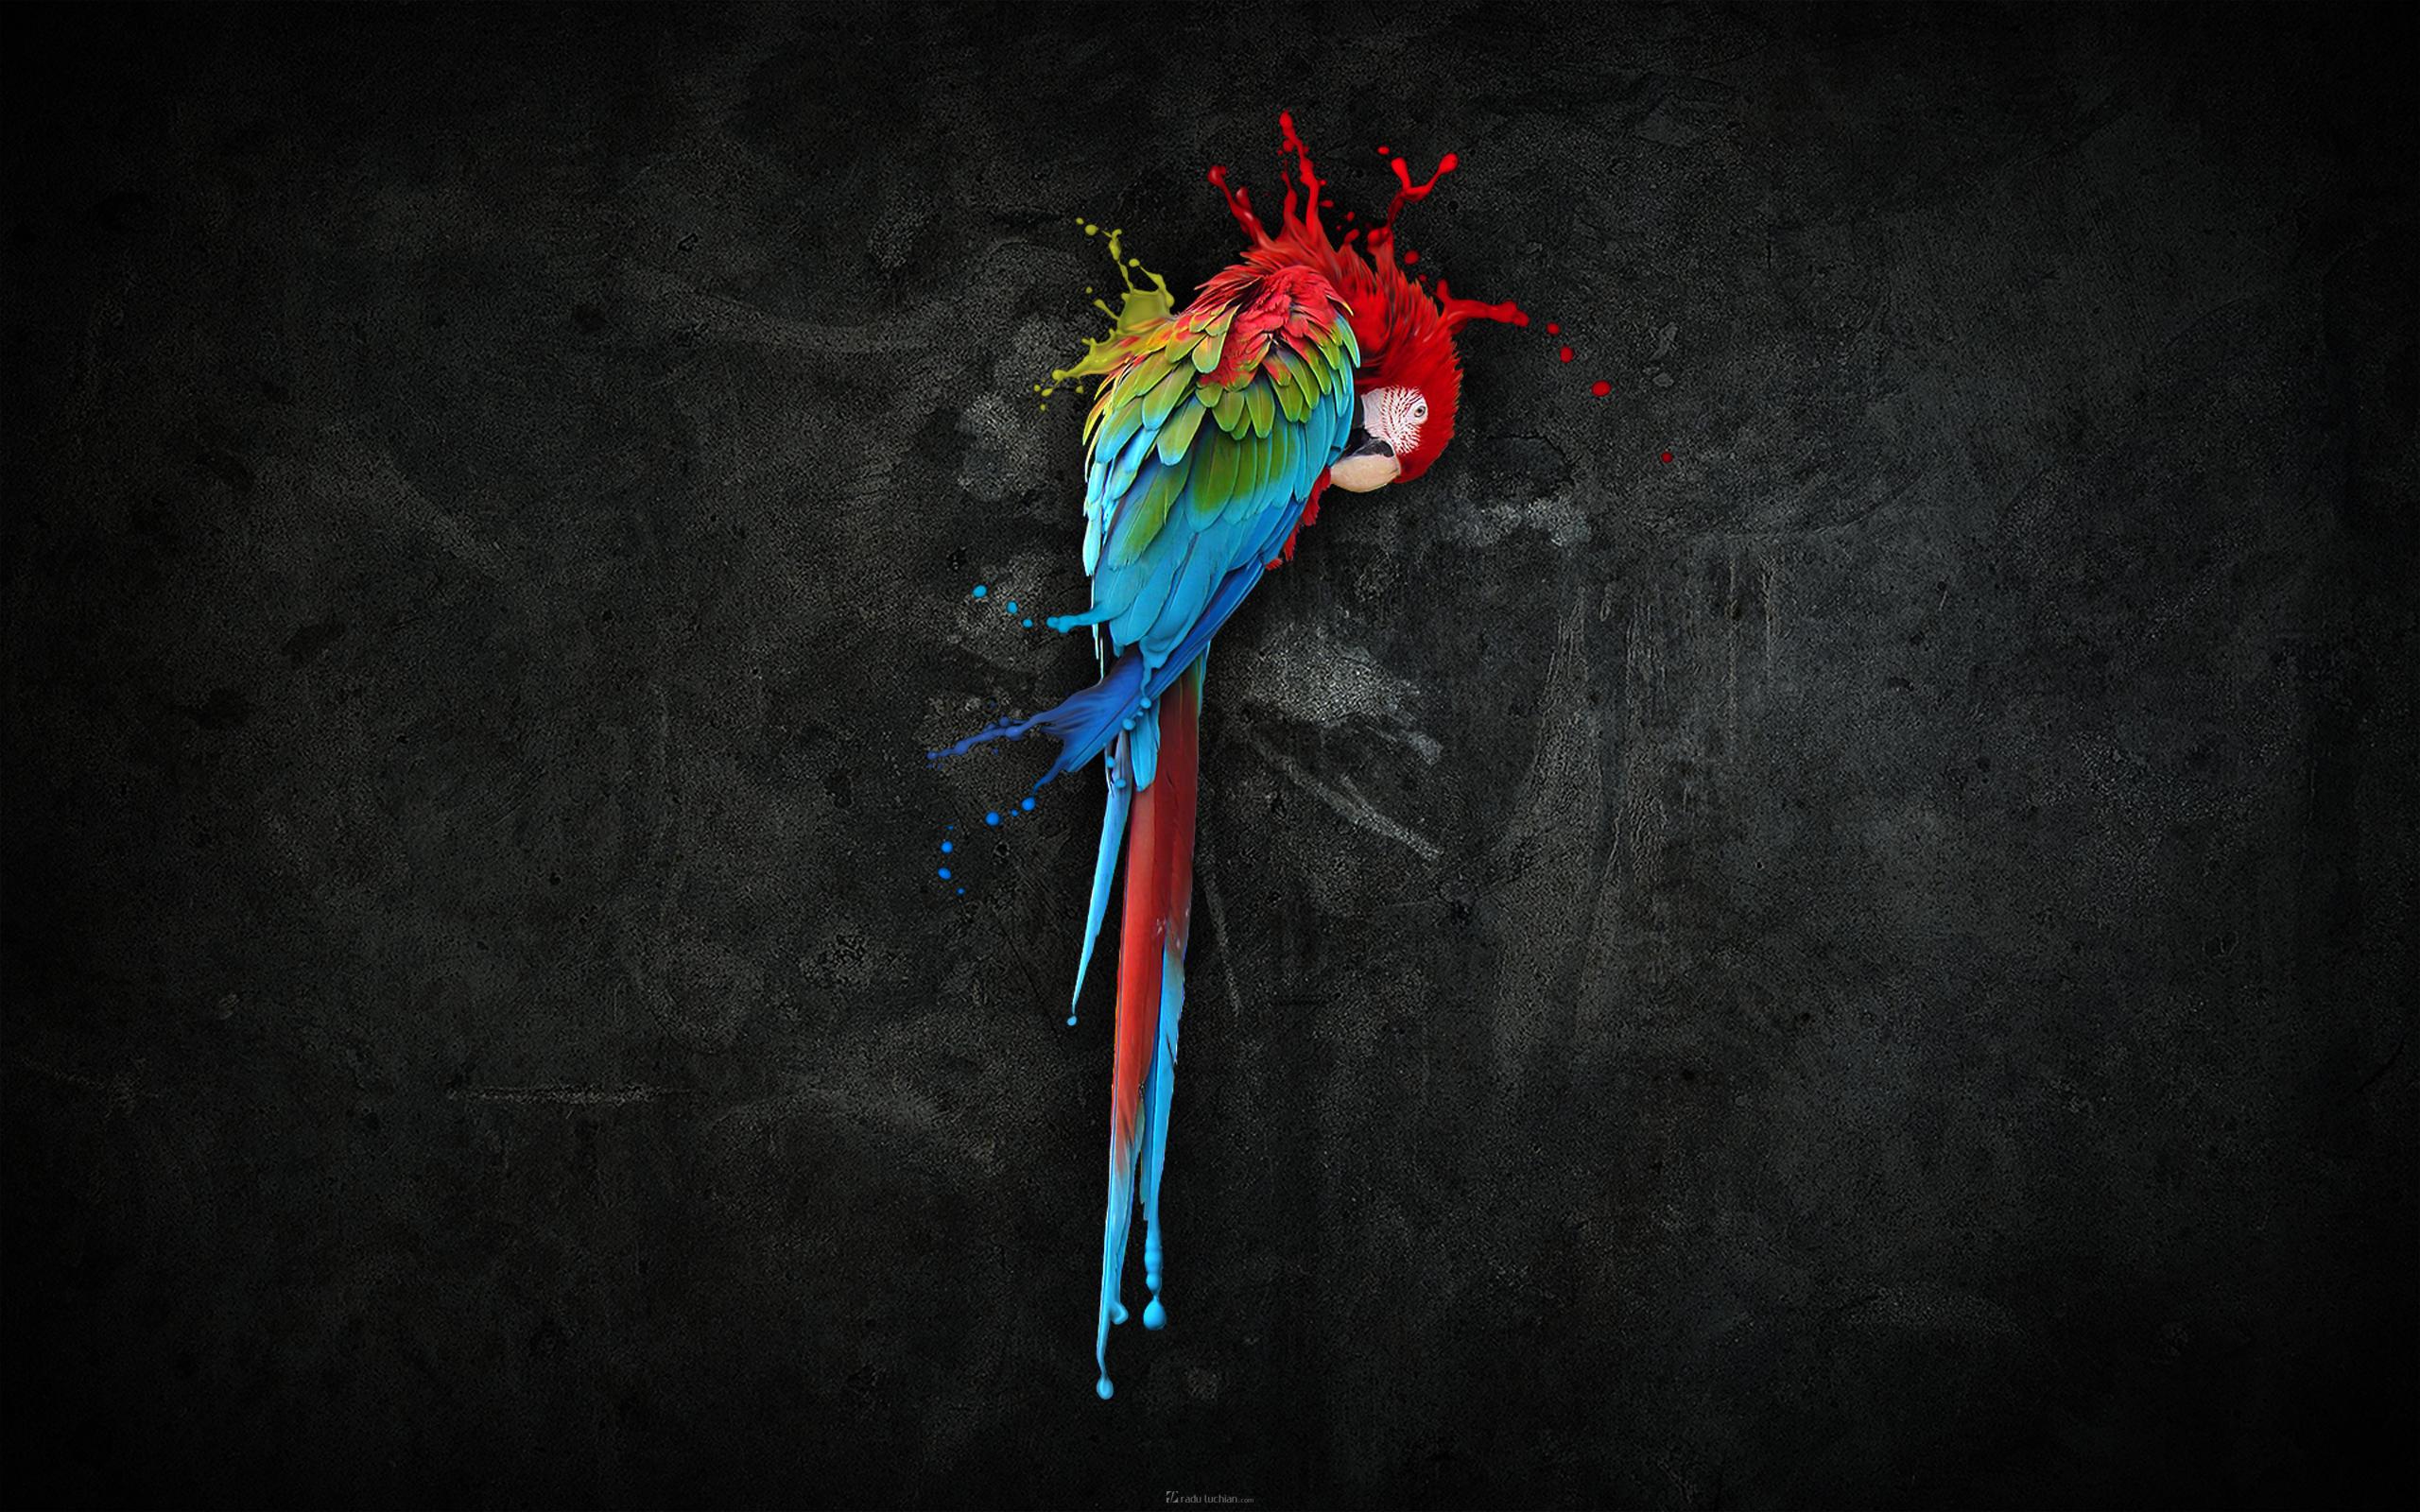 Wallpapers hd art impremedia amazing art wallpaper hd amazing parrot voltagebd Gallery